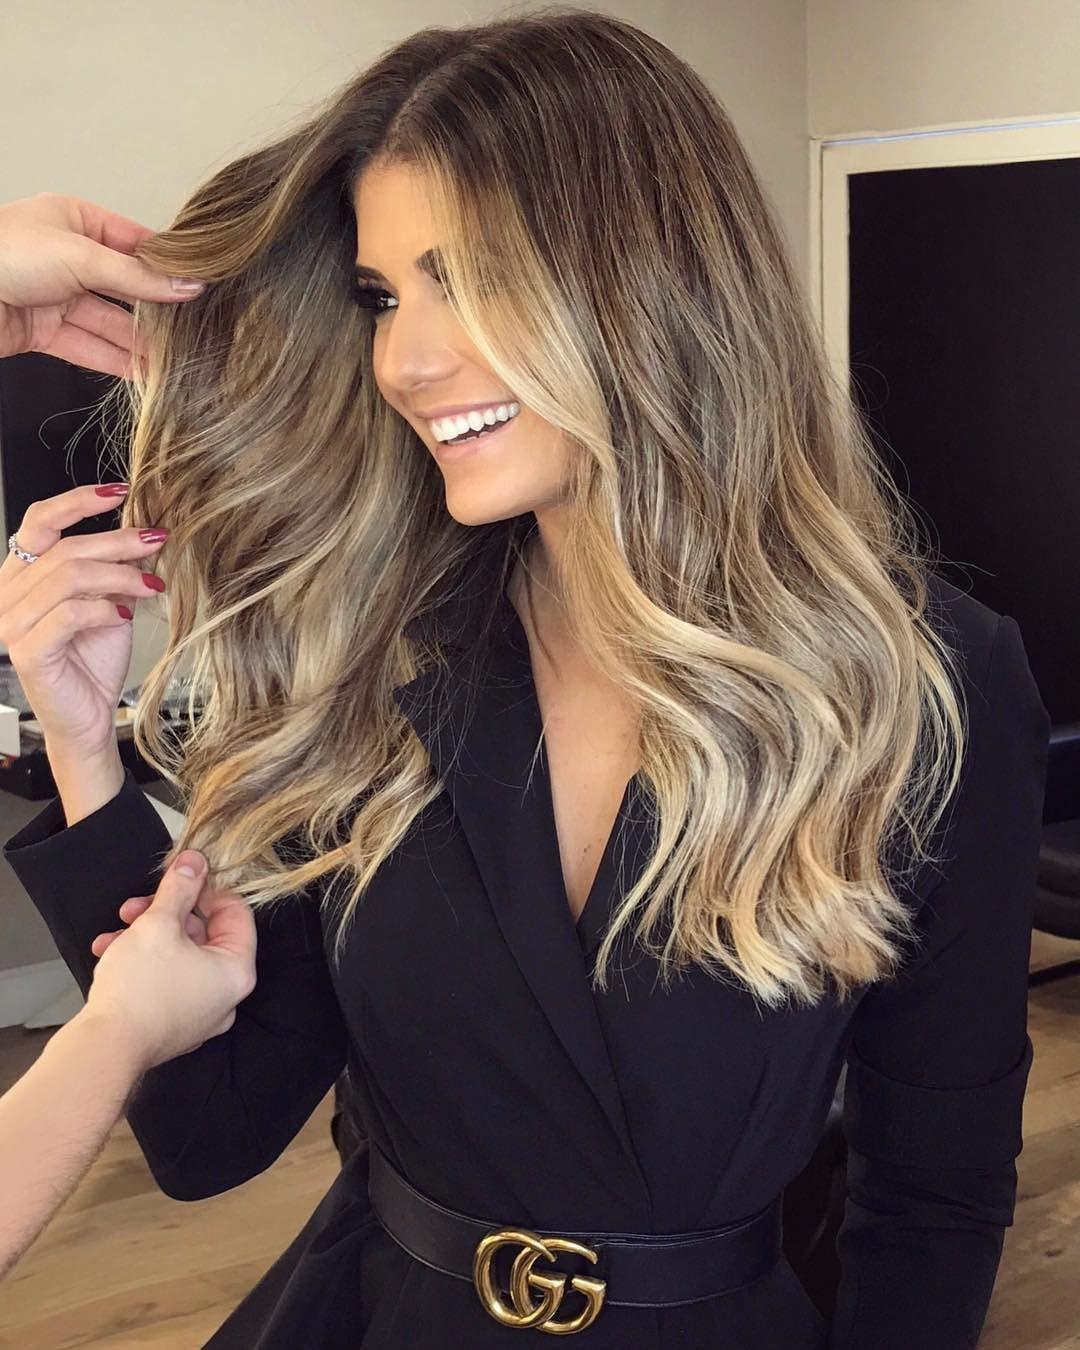 Hair Inspiration 2019-04-10 05:35:25